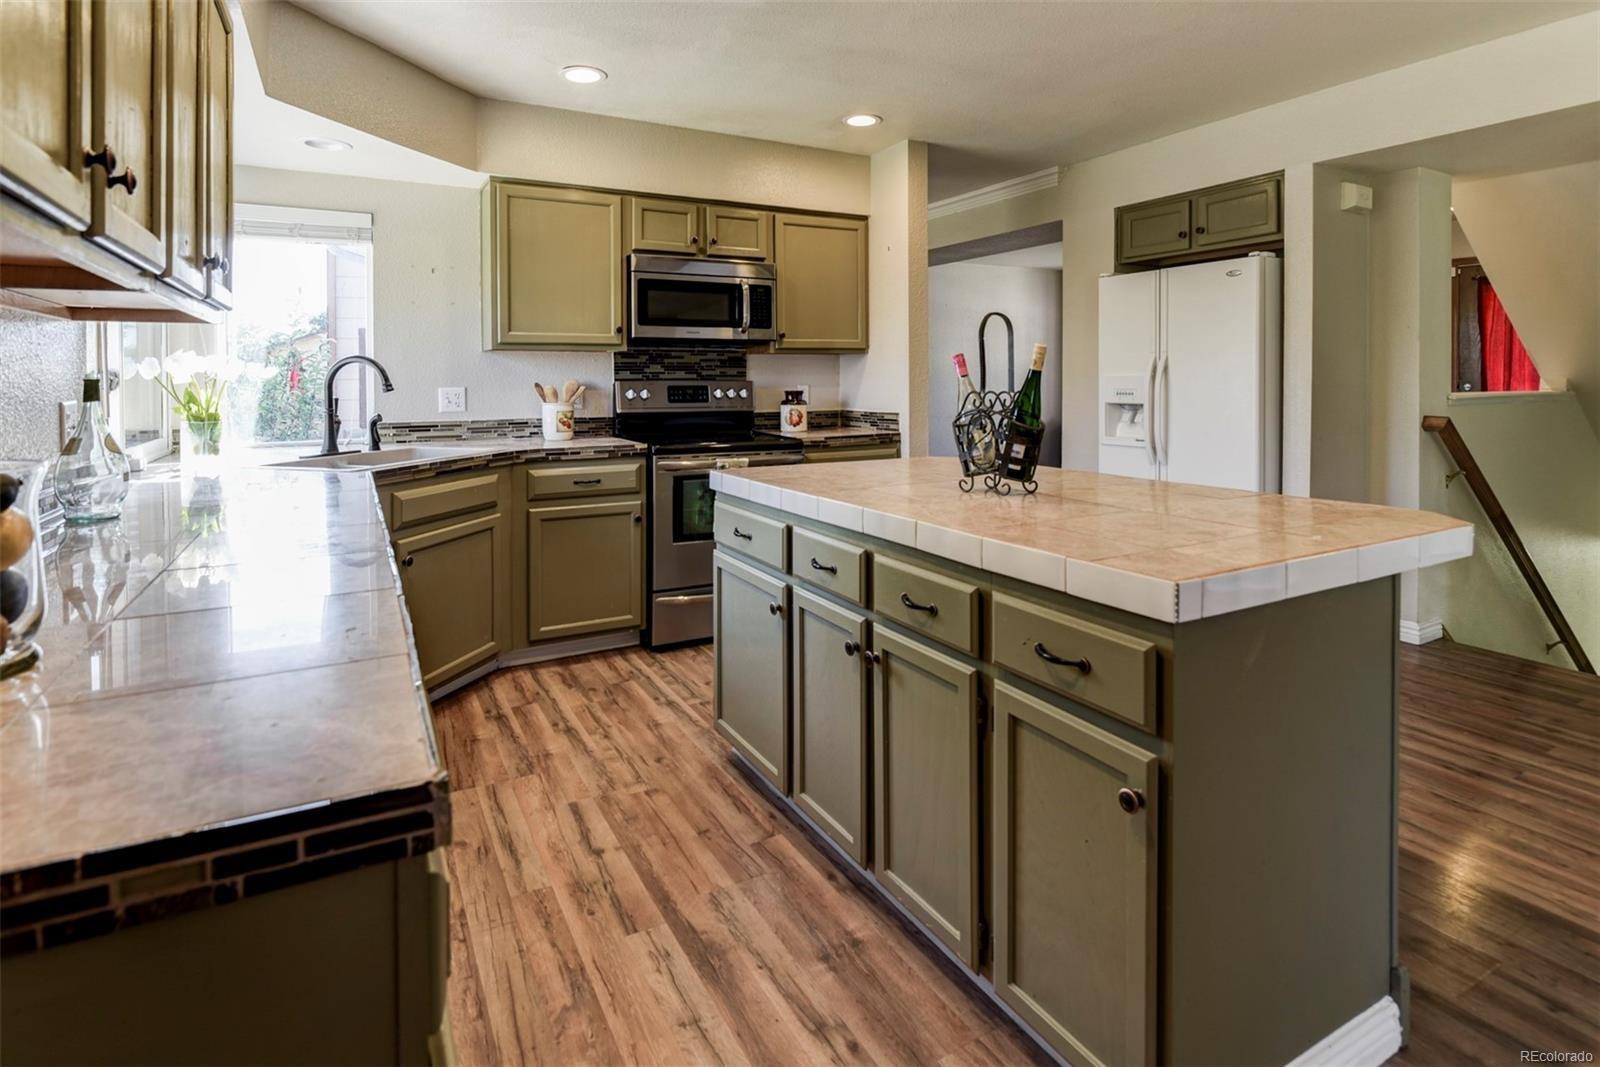 MLS# 6546824 - 1 - 1366  S Canoe Creek Drive, Colorado Springs, CO 80906